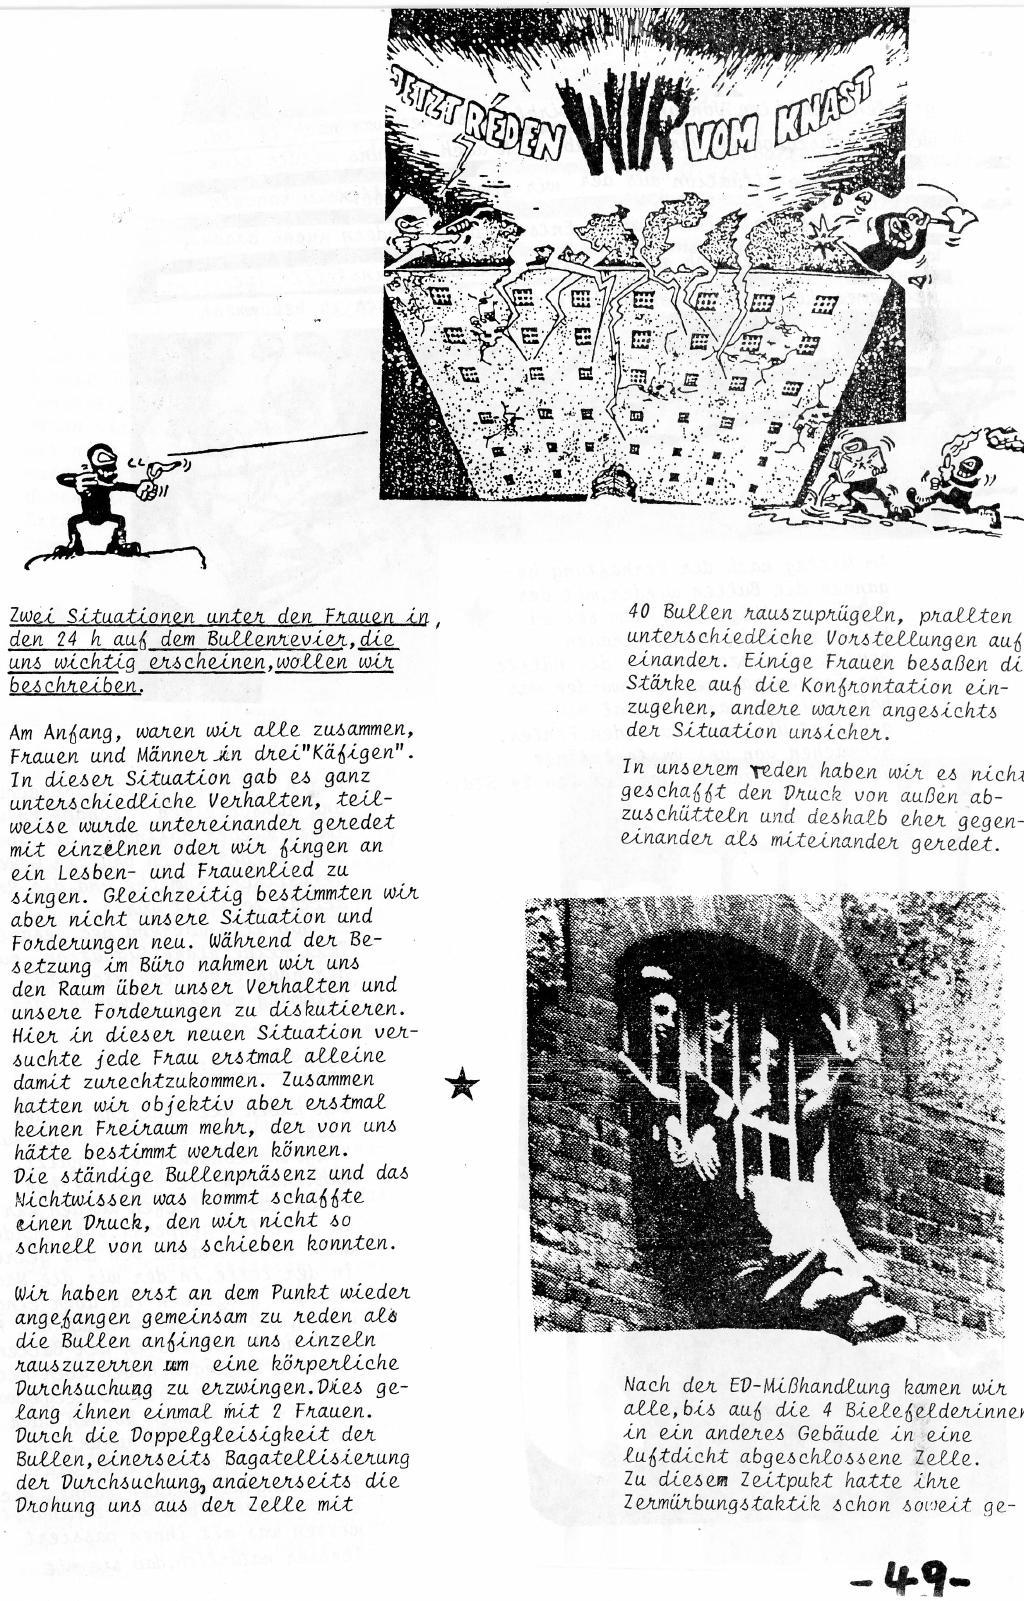 Belgien_Doku_Besetzung_EG_Kommission_1989_051